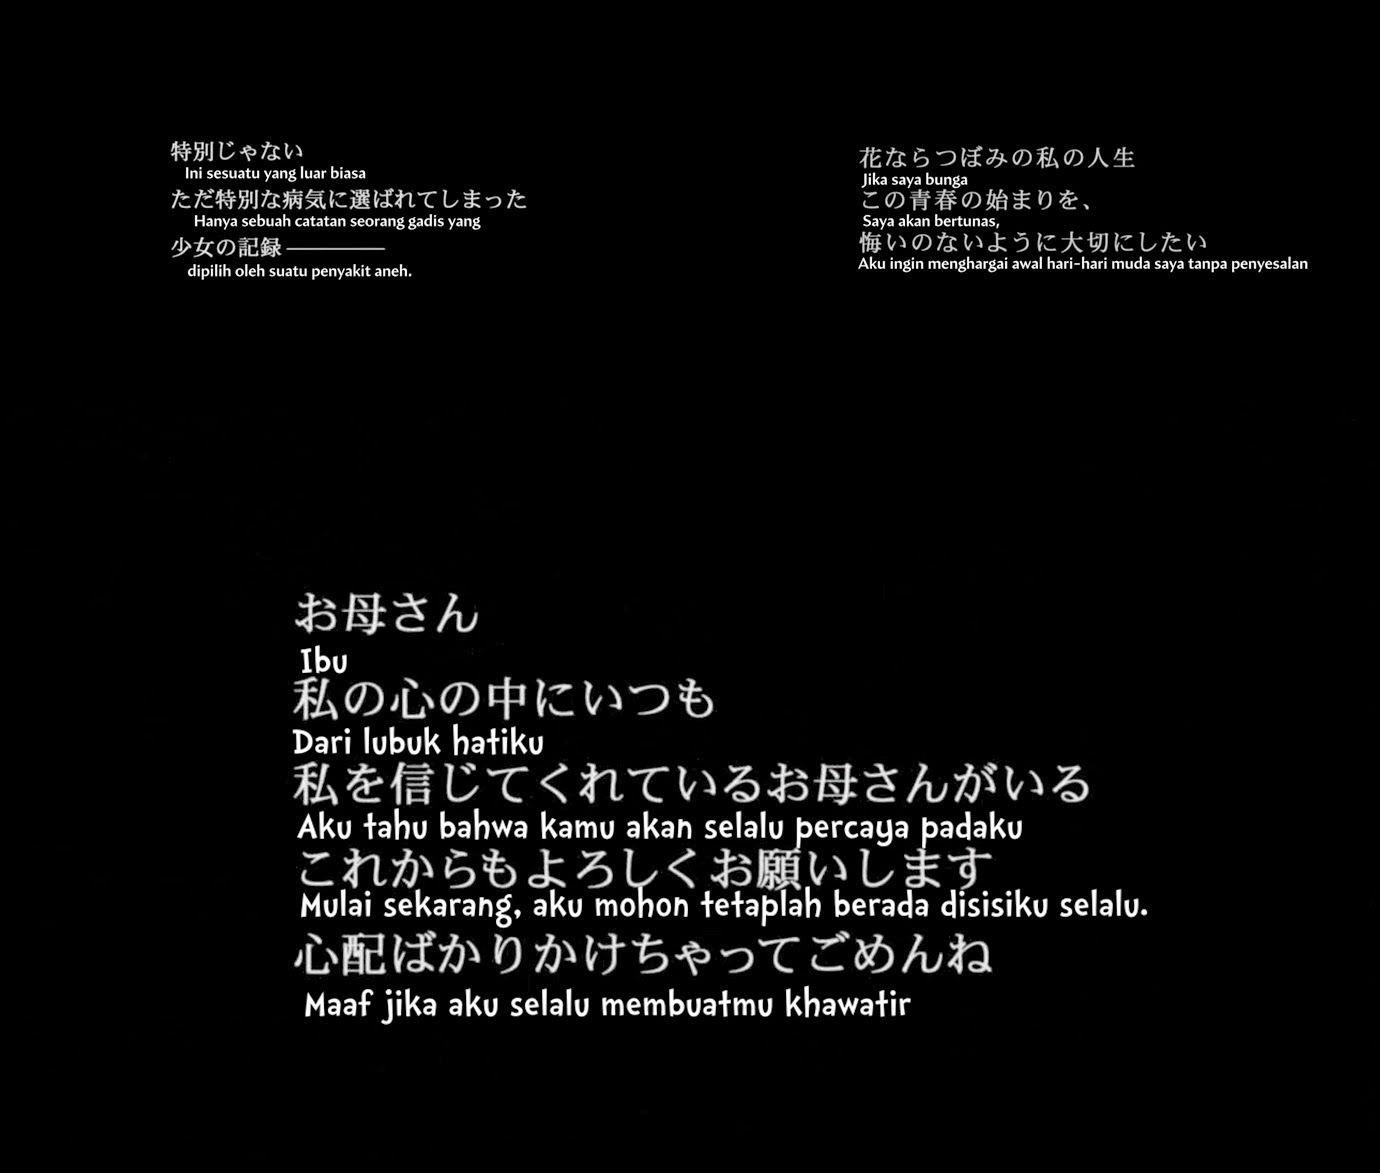 1 litre of tears 2005 episode 01 11 end sub indonesia shinokun